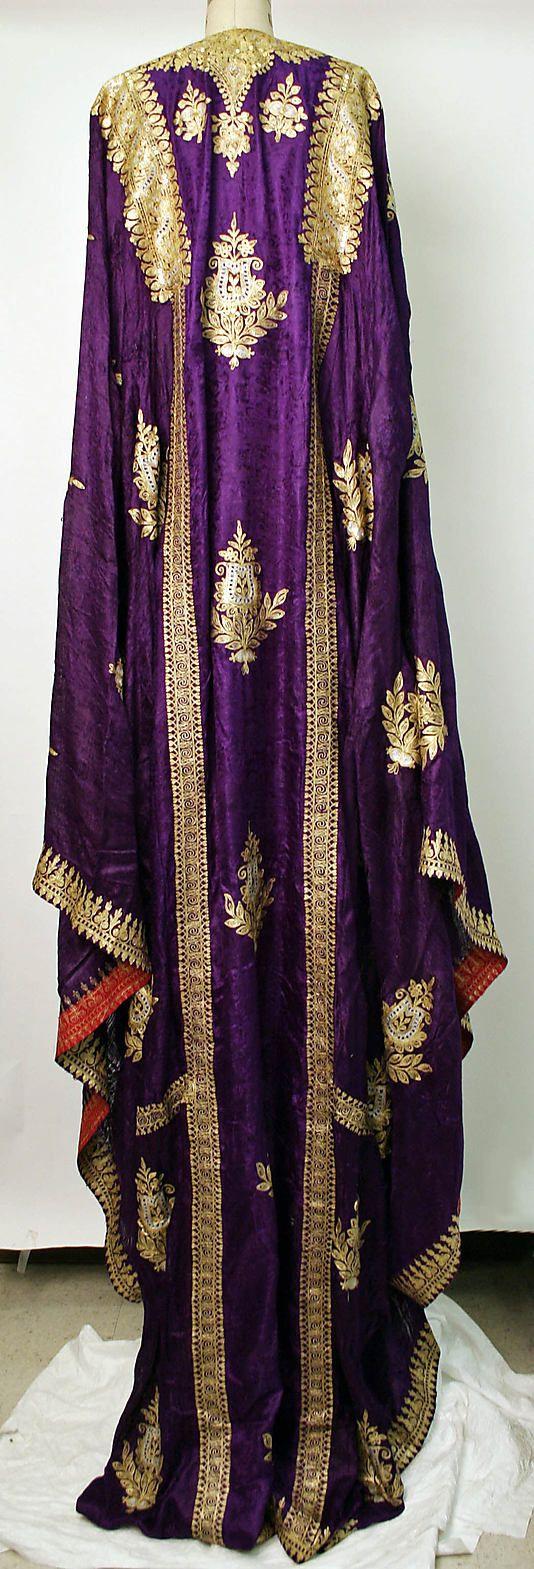 Robe    Date:      1962  Culture:      Saudi  Medium:      silk, metallic thread, sequins  Dimensions:      Length at CB: 88 in. (223.5 cm)  Credit Line:      Gift of Mrs. James J. Rorimer, 1980  Accession Number:      1980.253.1